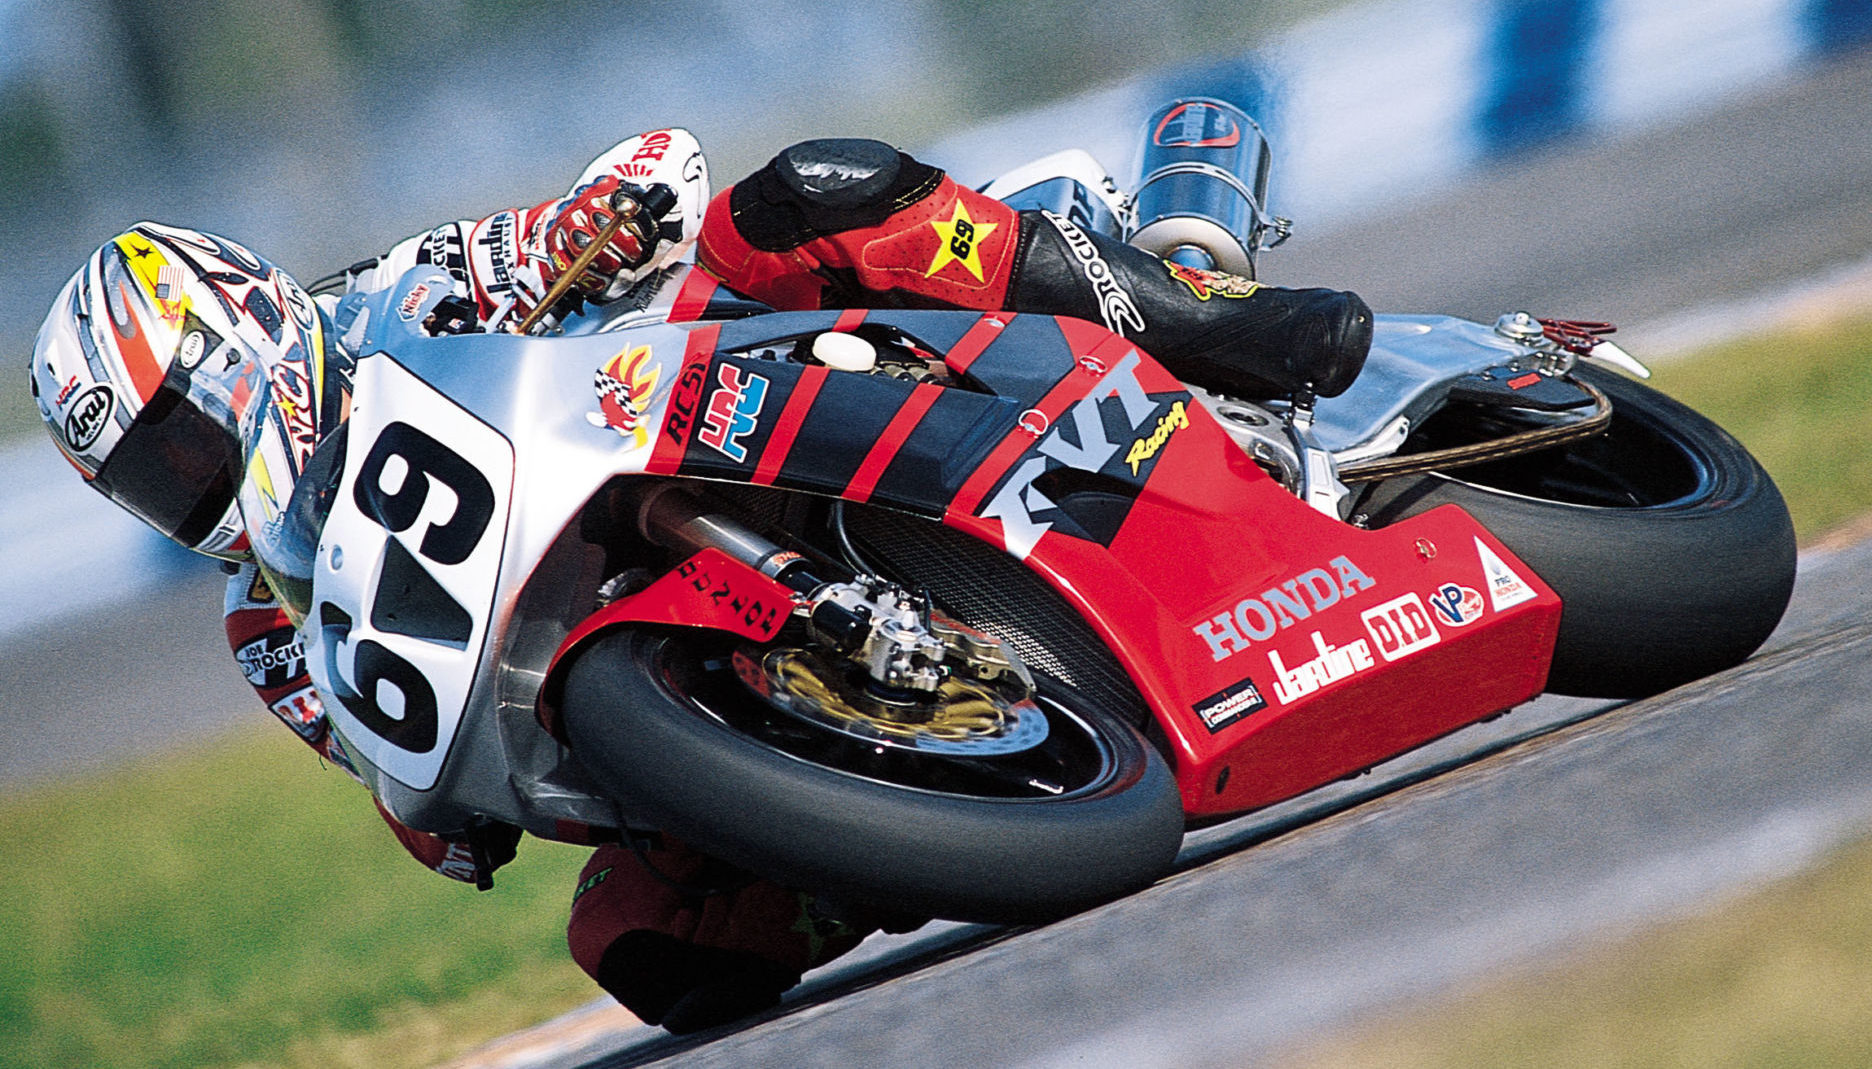 Nicky Hayden (69) on his American Honda RC51 AMA Superbike, circa 2002. Photo courtesy American Honda.